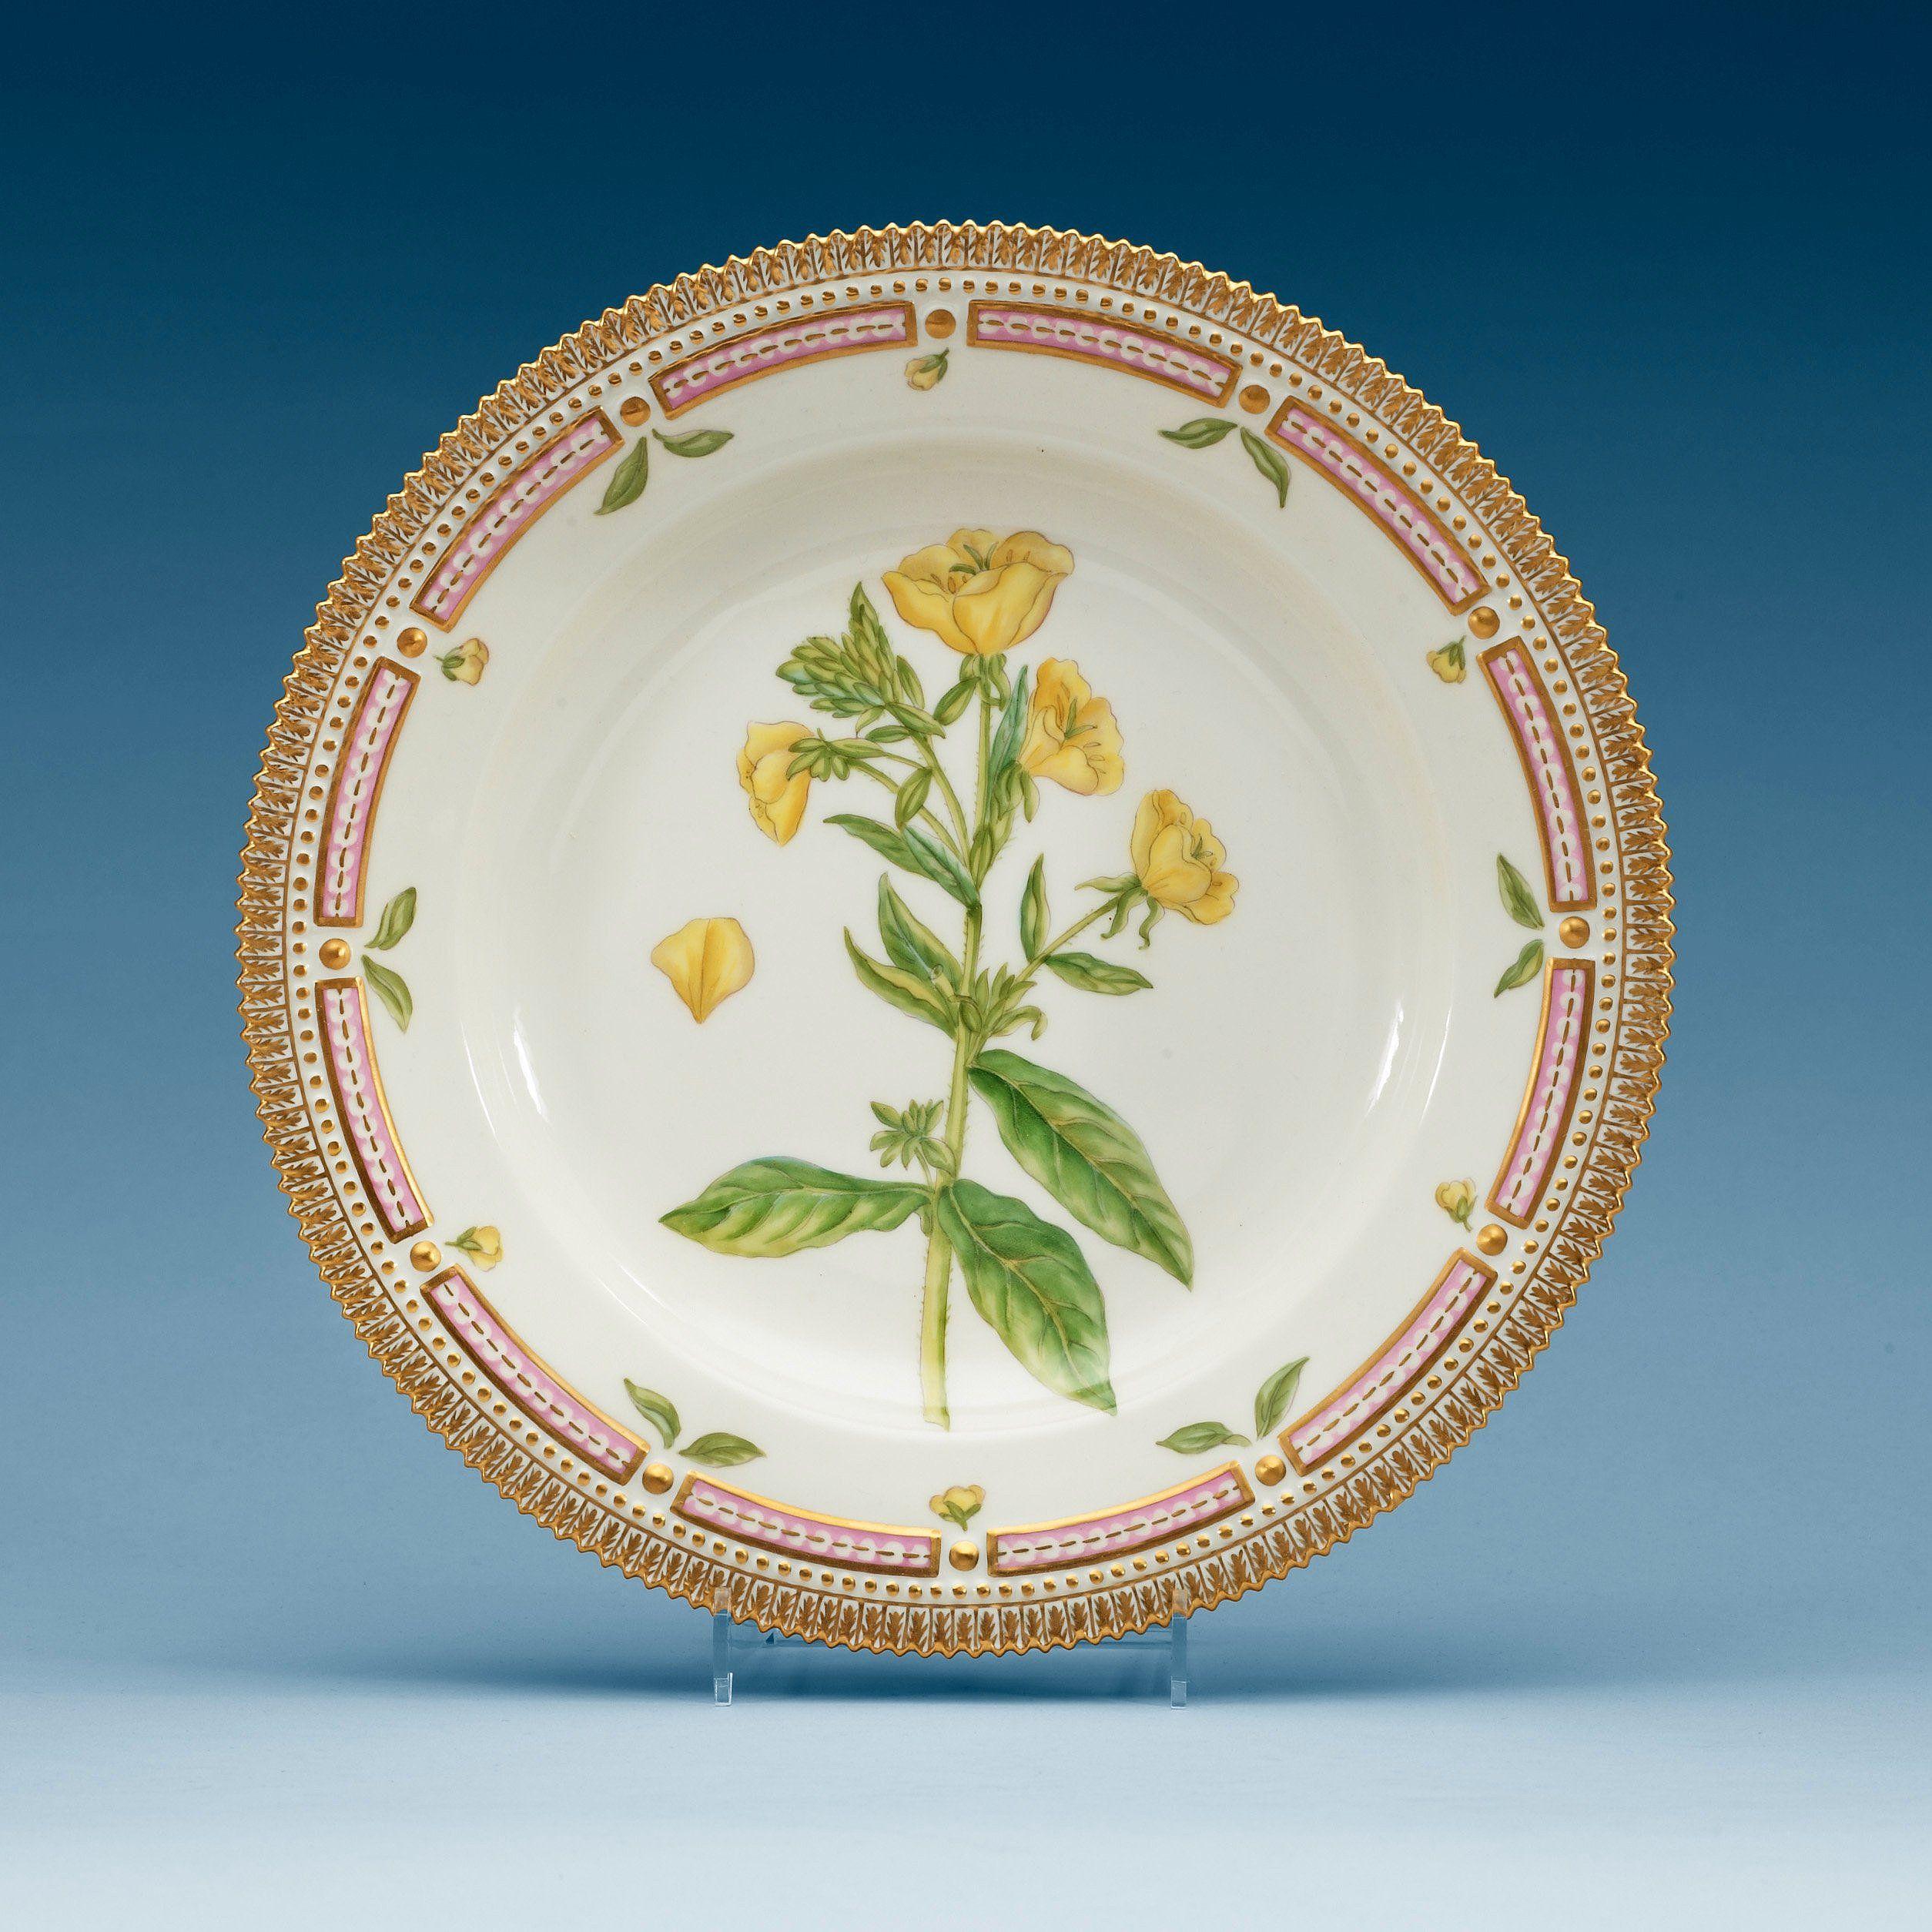 A SET OF 13 ROYAL COPENHAGEN 'FLORA DANICA' DINNER PLATES, DENMARK, 20TH CENTURY.